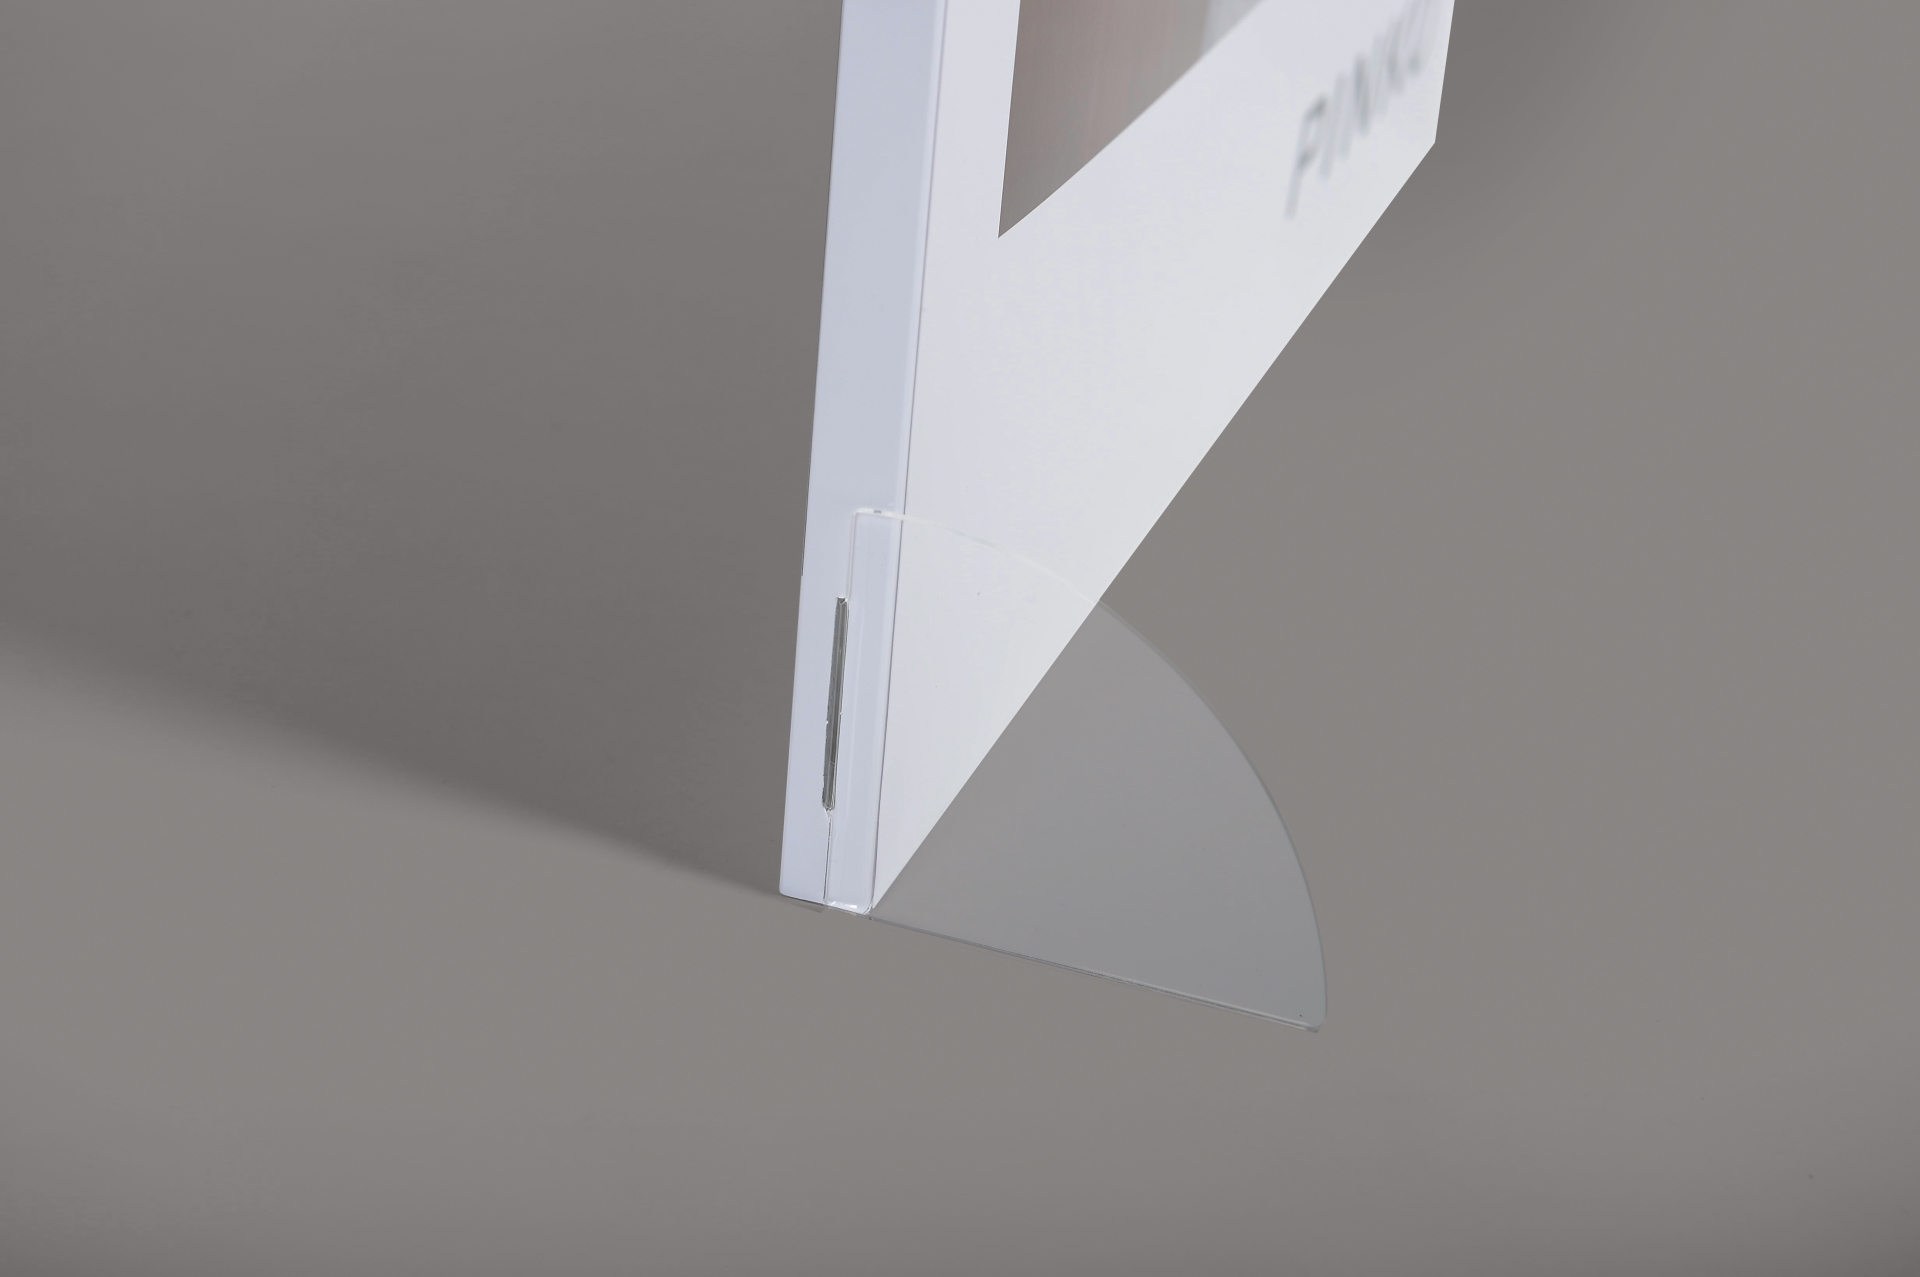 Visual display | Pinko - Centroffset stampa, packaging, grafica